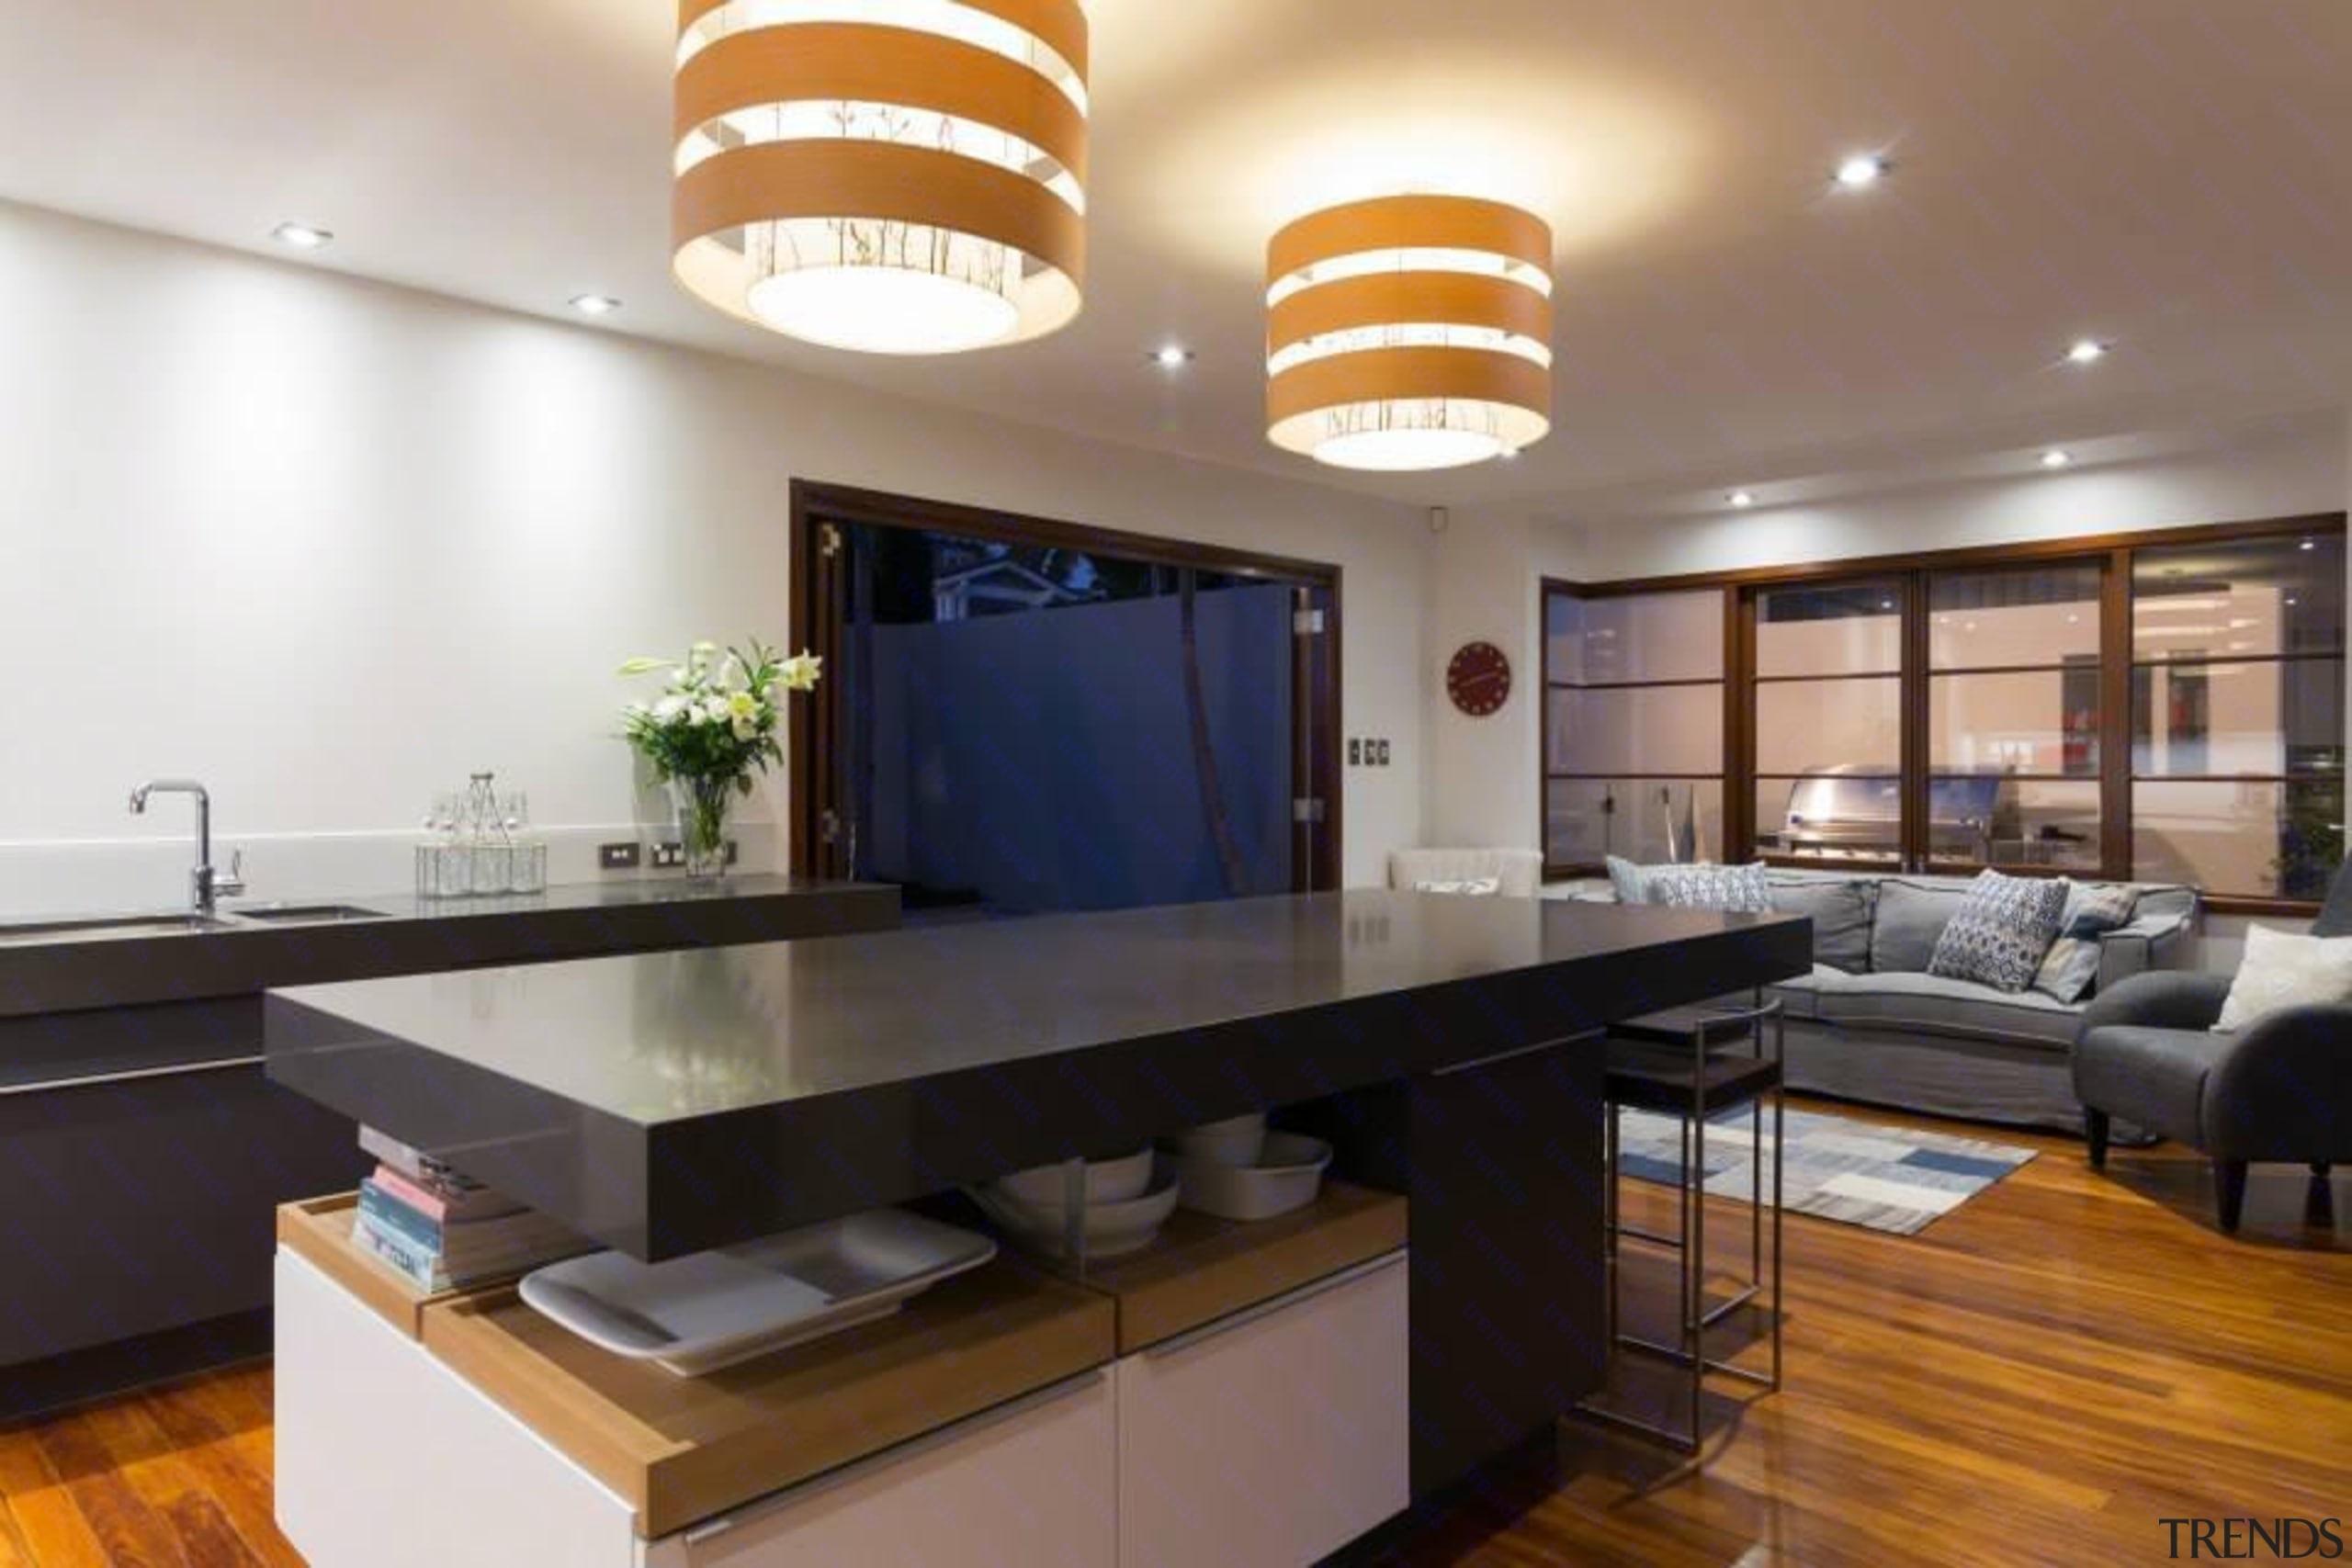 Poggenpohl Plus Modo – See more ceiling, countertop, interior design, kitchen, living room, real estate, room, white